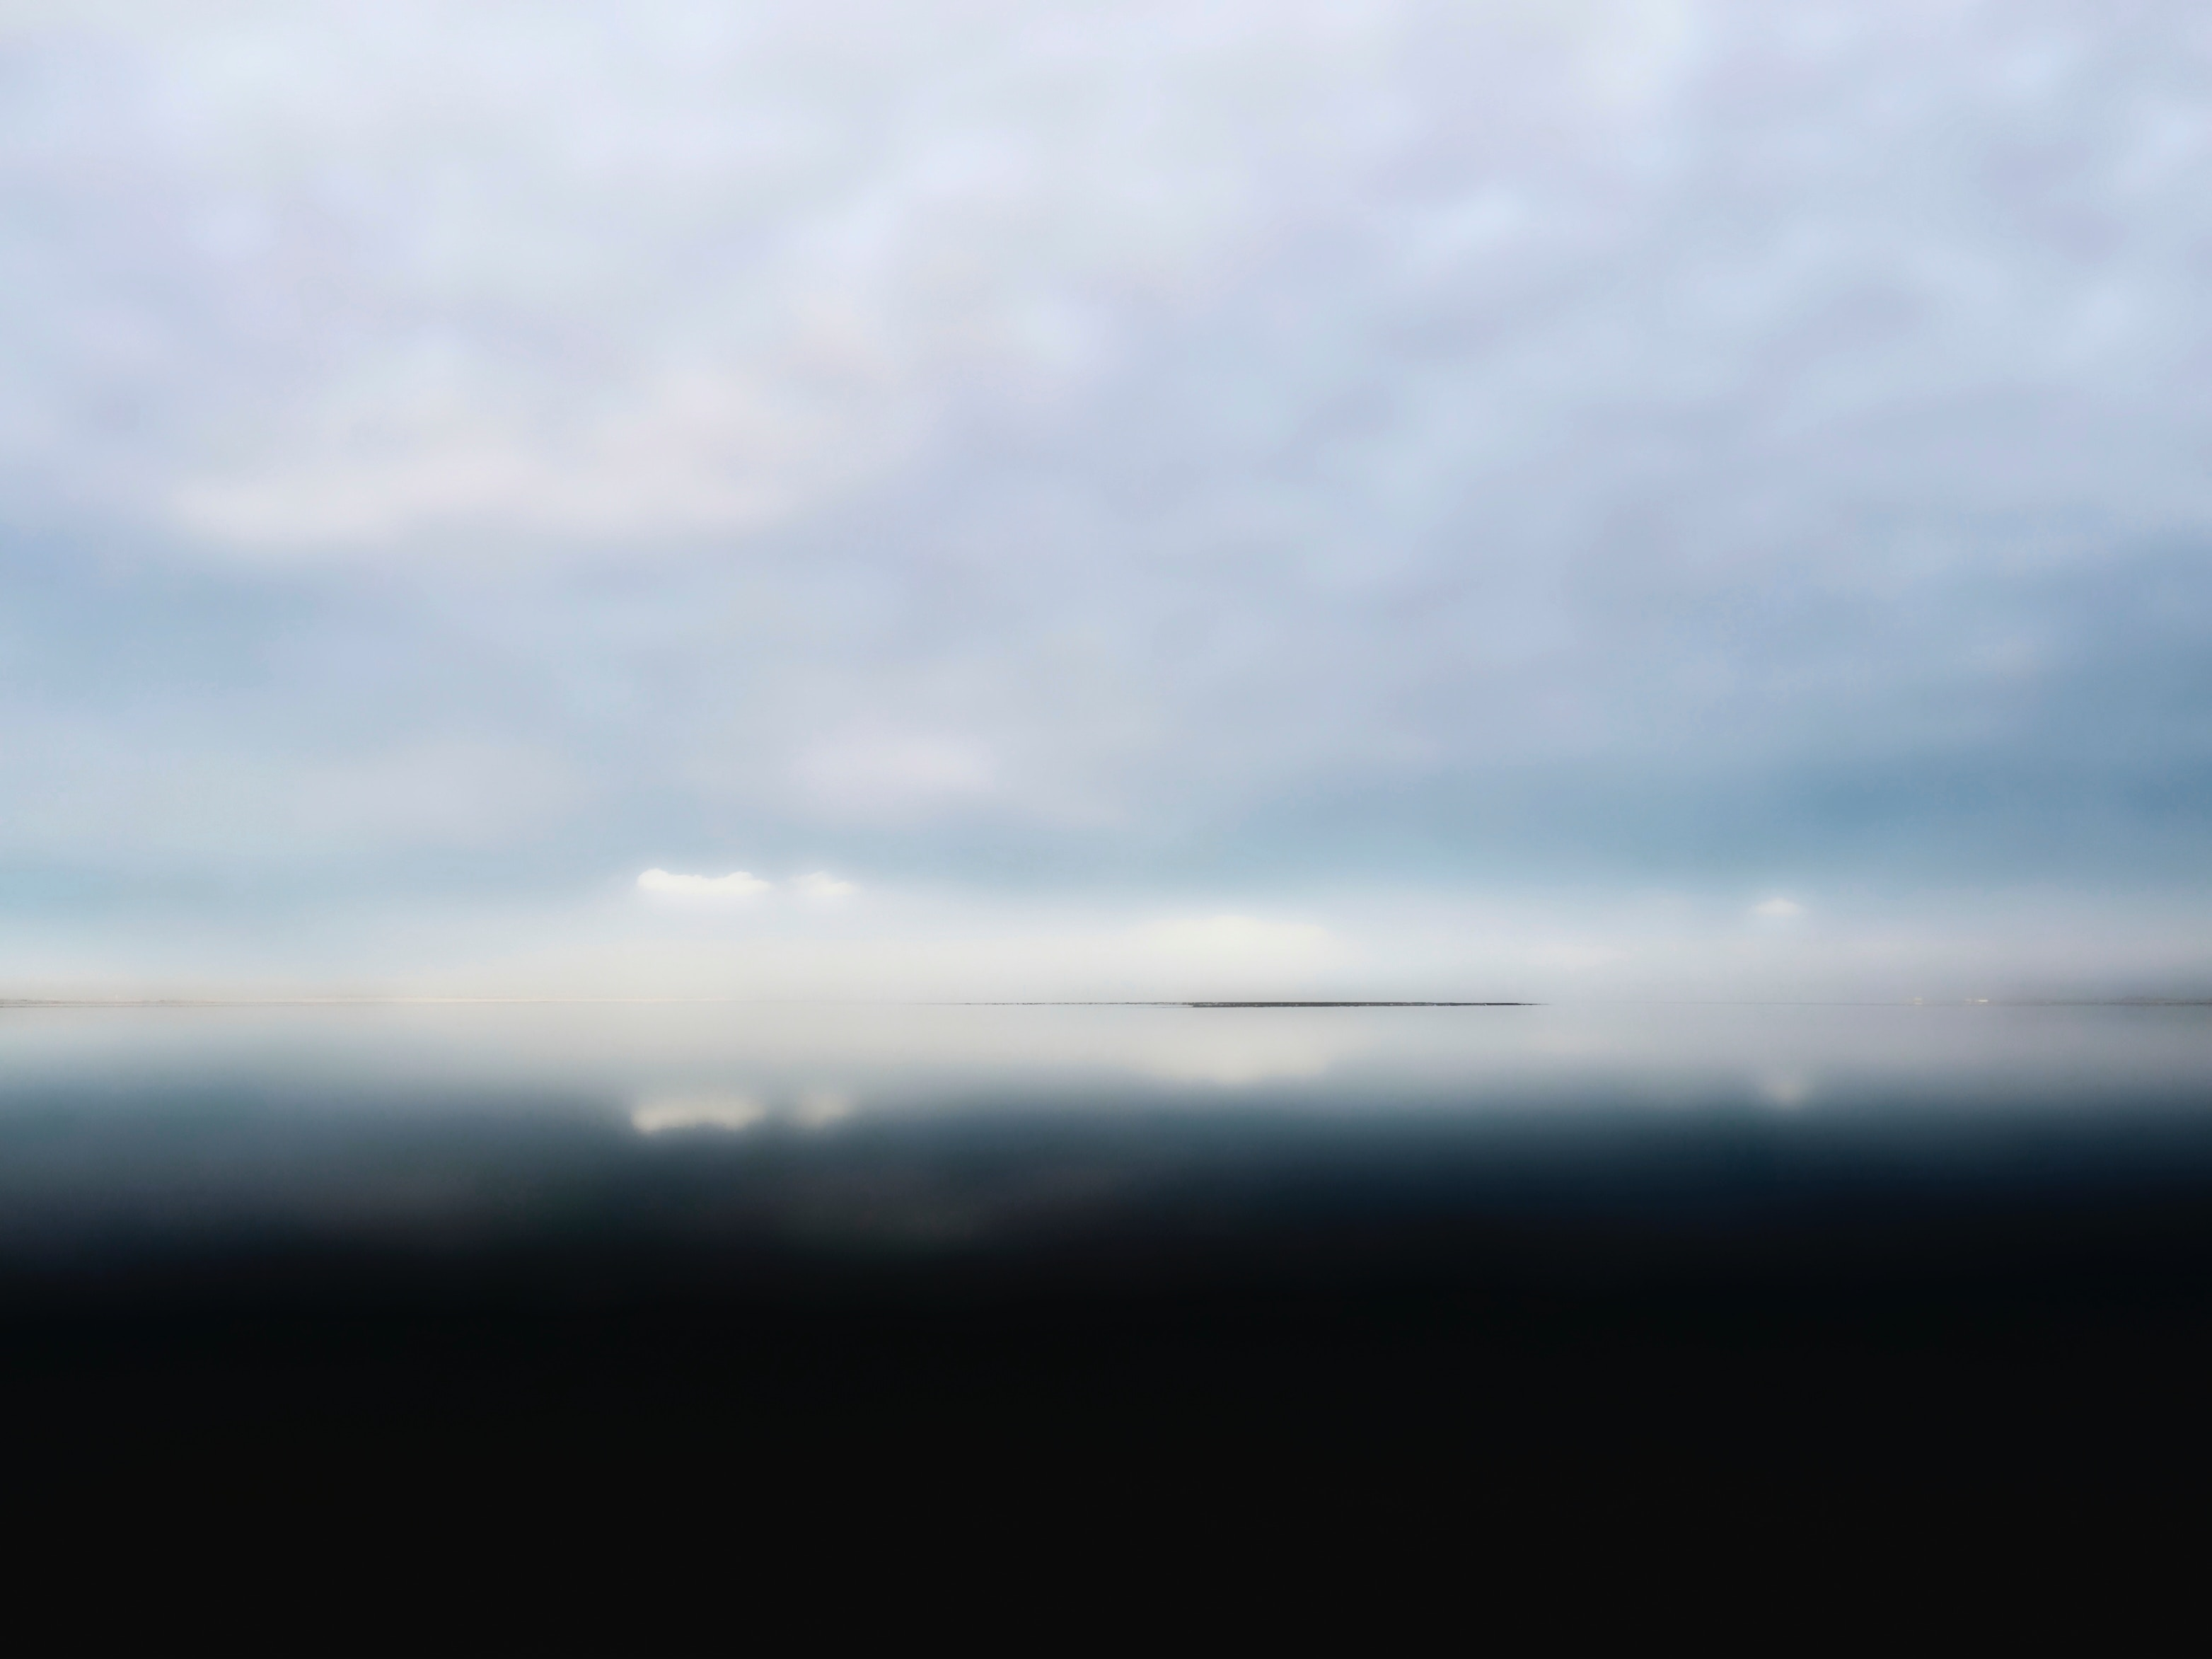 davidcohen-240663-unsplash